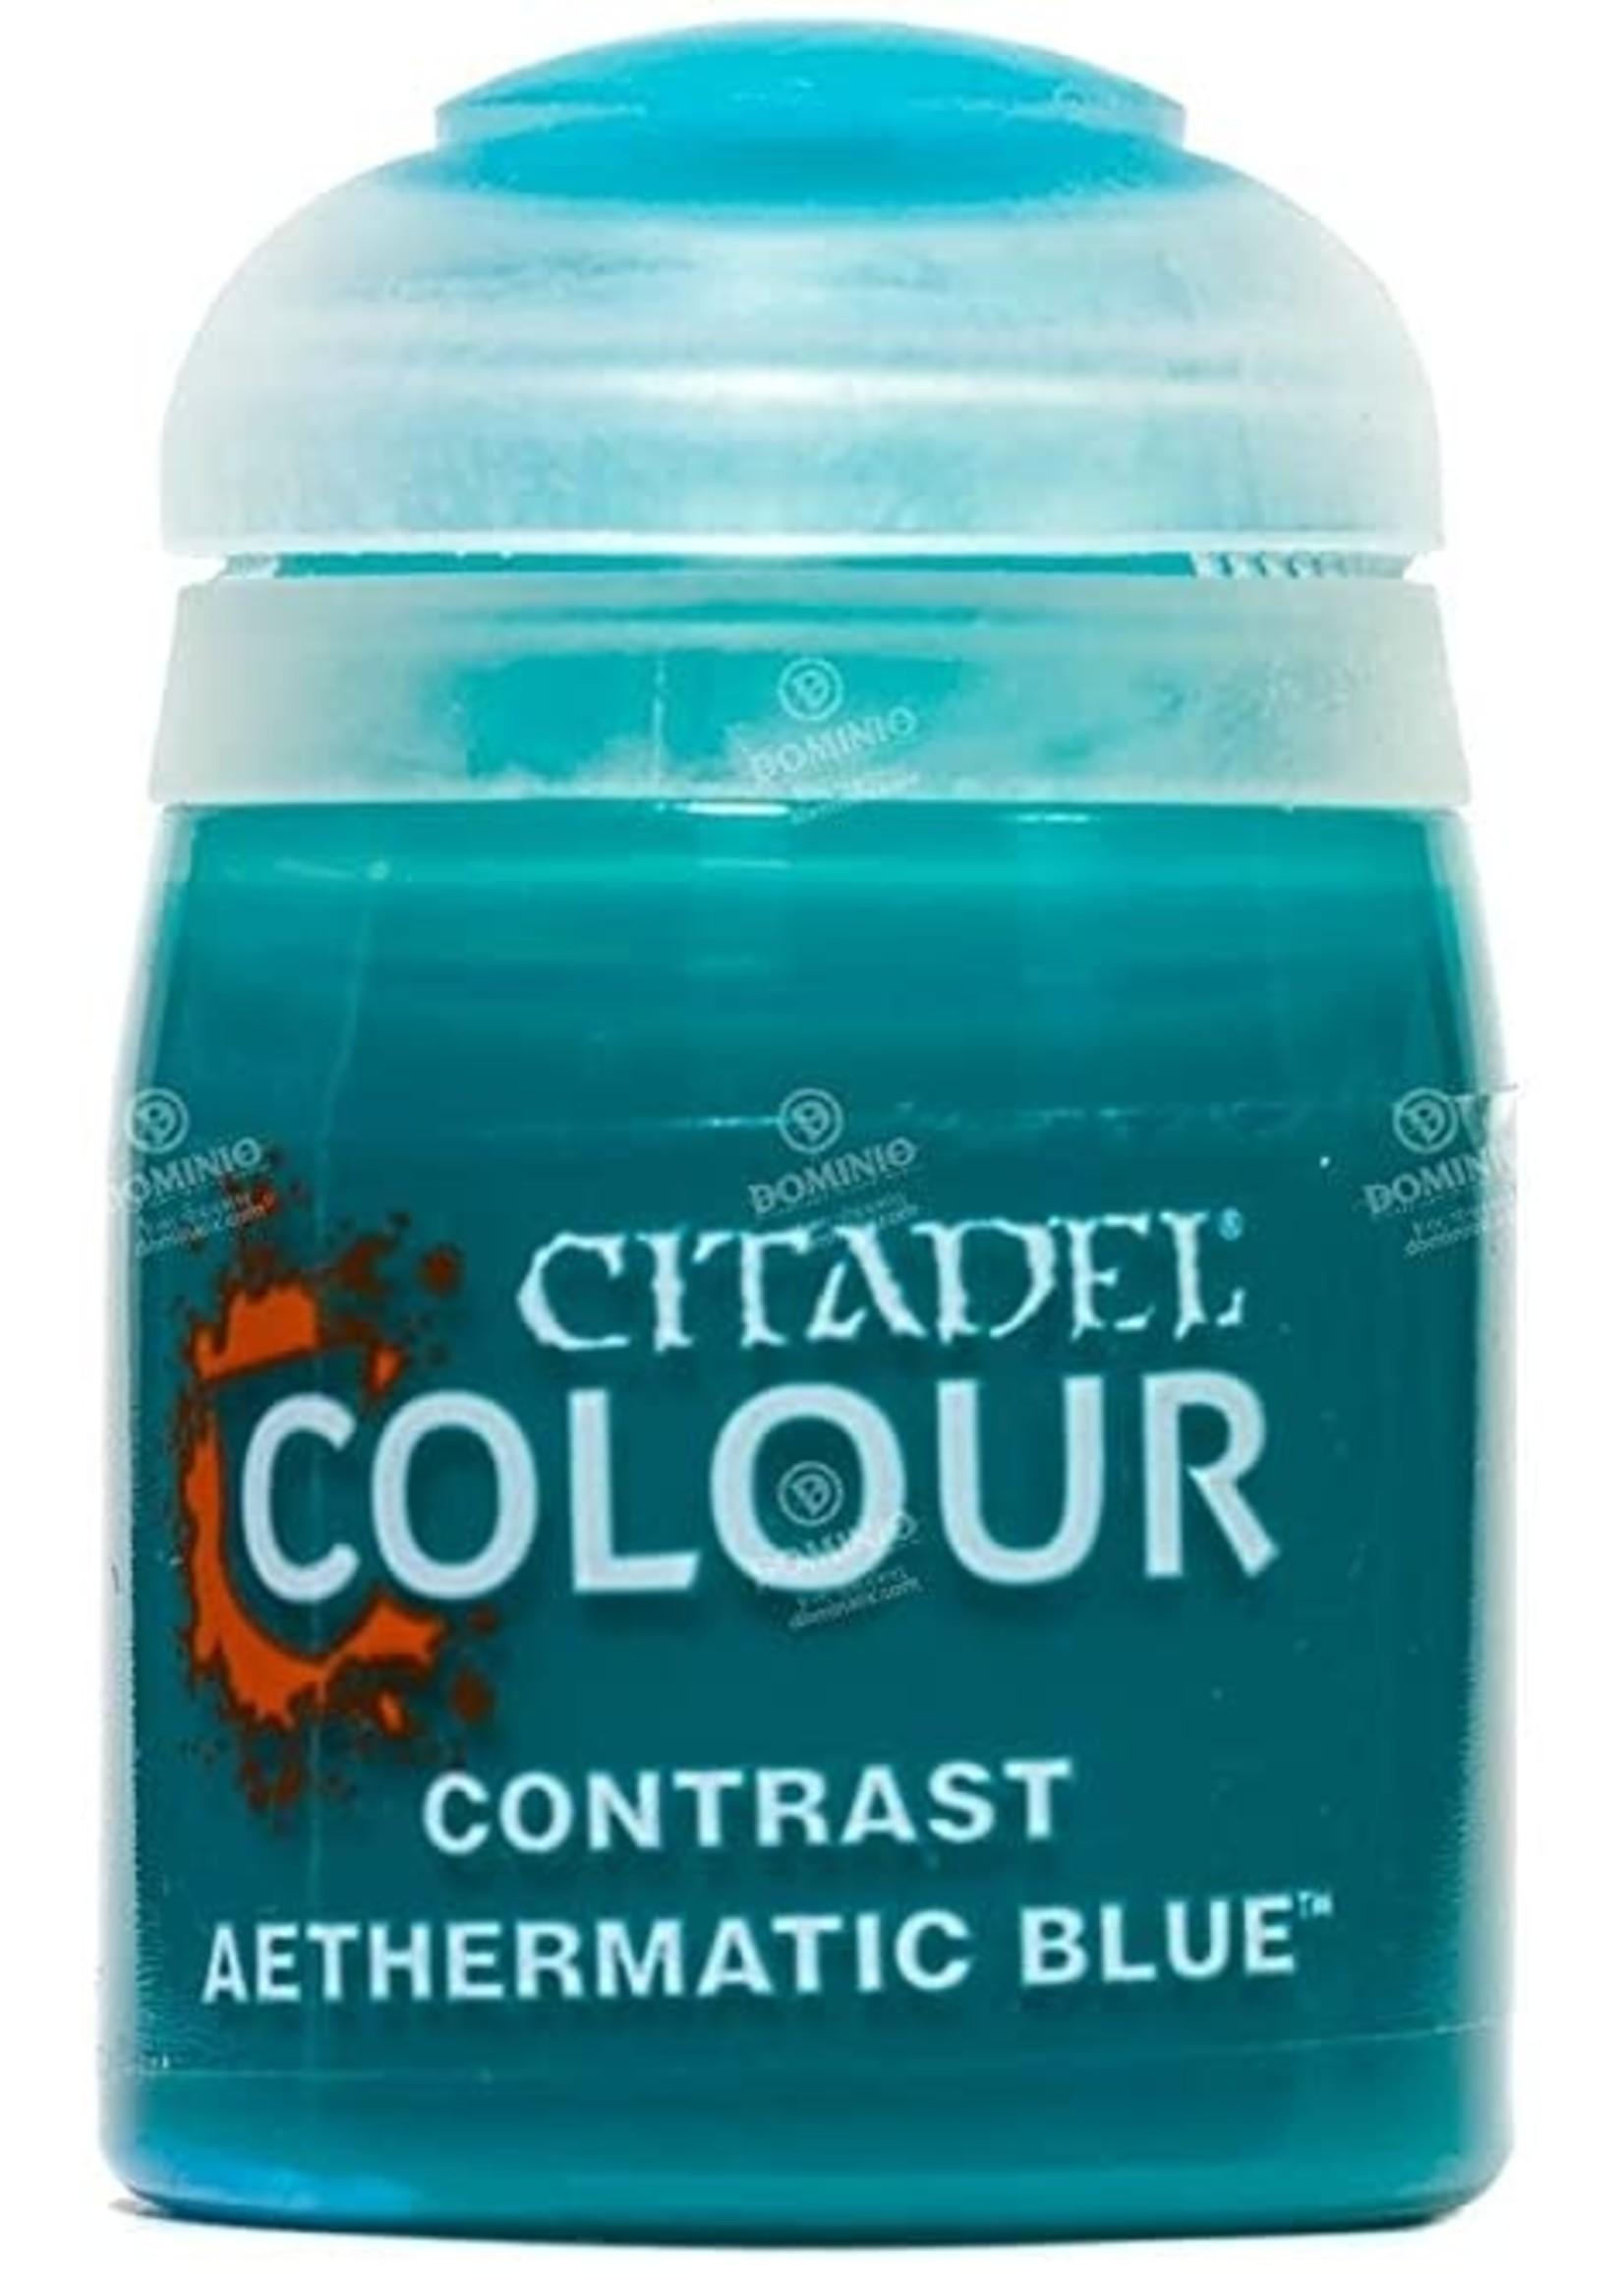 Games Workshop Citadel Paint: Aethermatic Blue Contrast (18 ml)